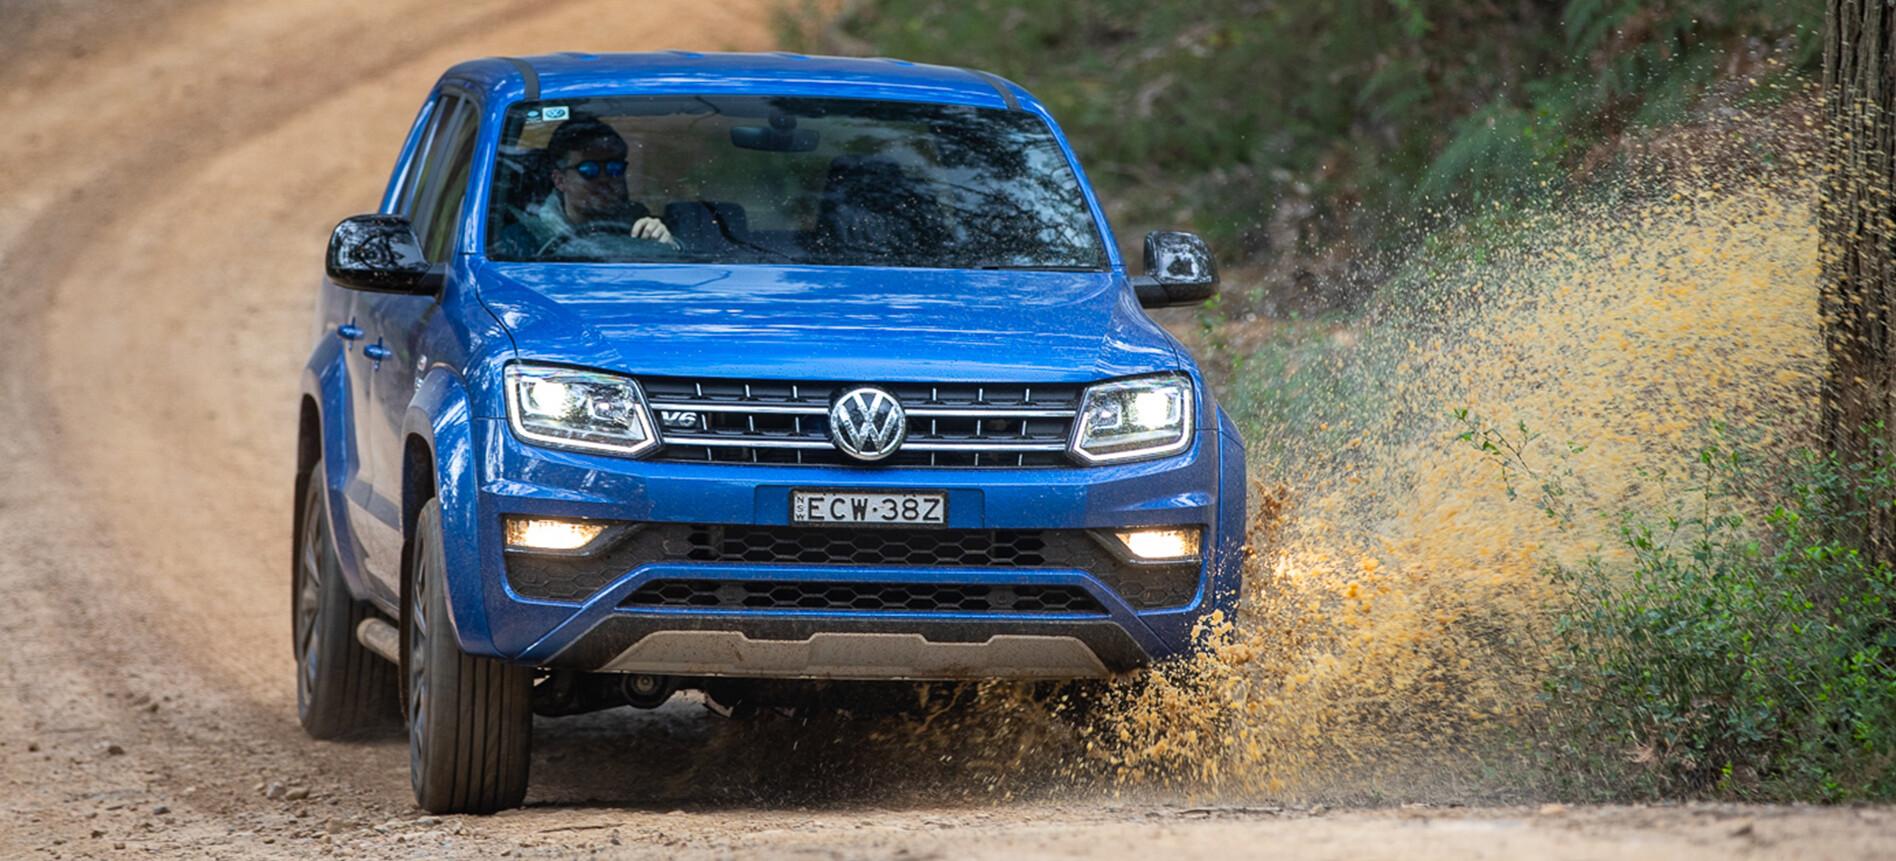 2020 Volkswagen Amarok V6 TDI580 Highline review